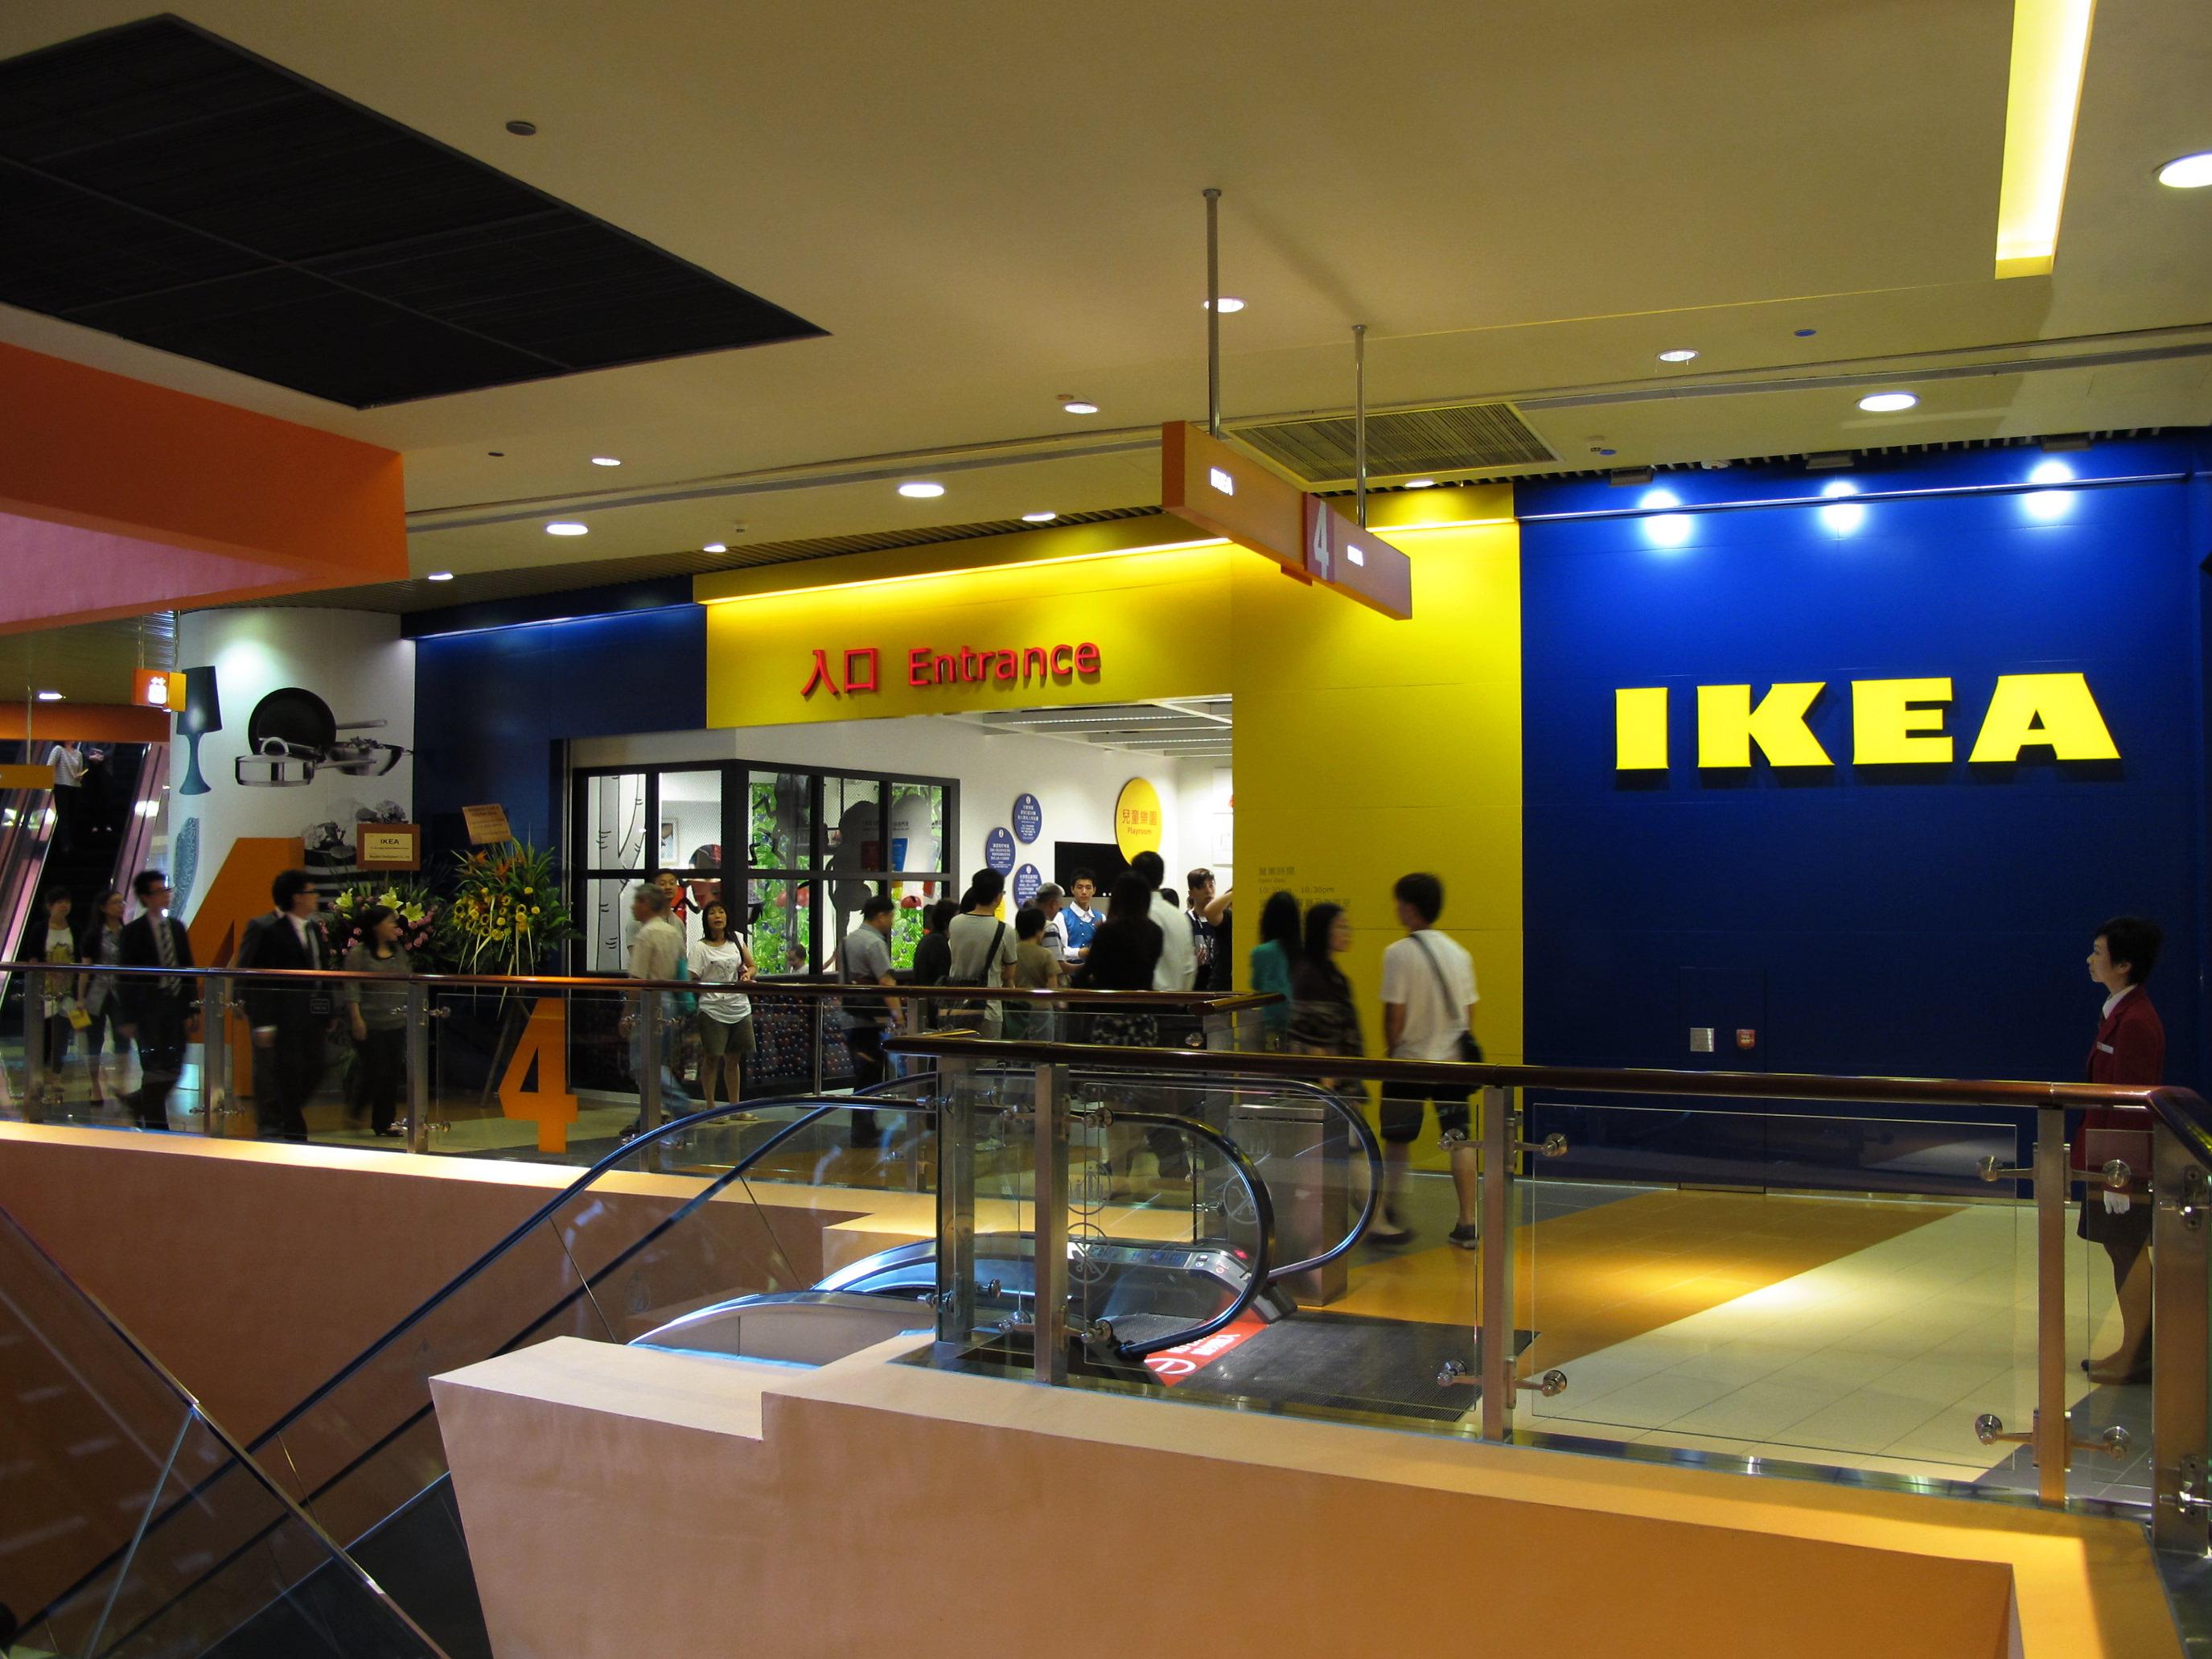 Afragola, assalto all'Ikea: banditi armati rapinano l'incasso ai vigilantes